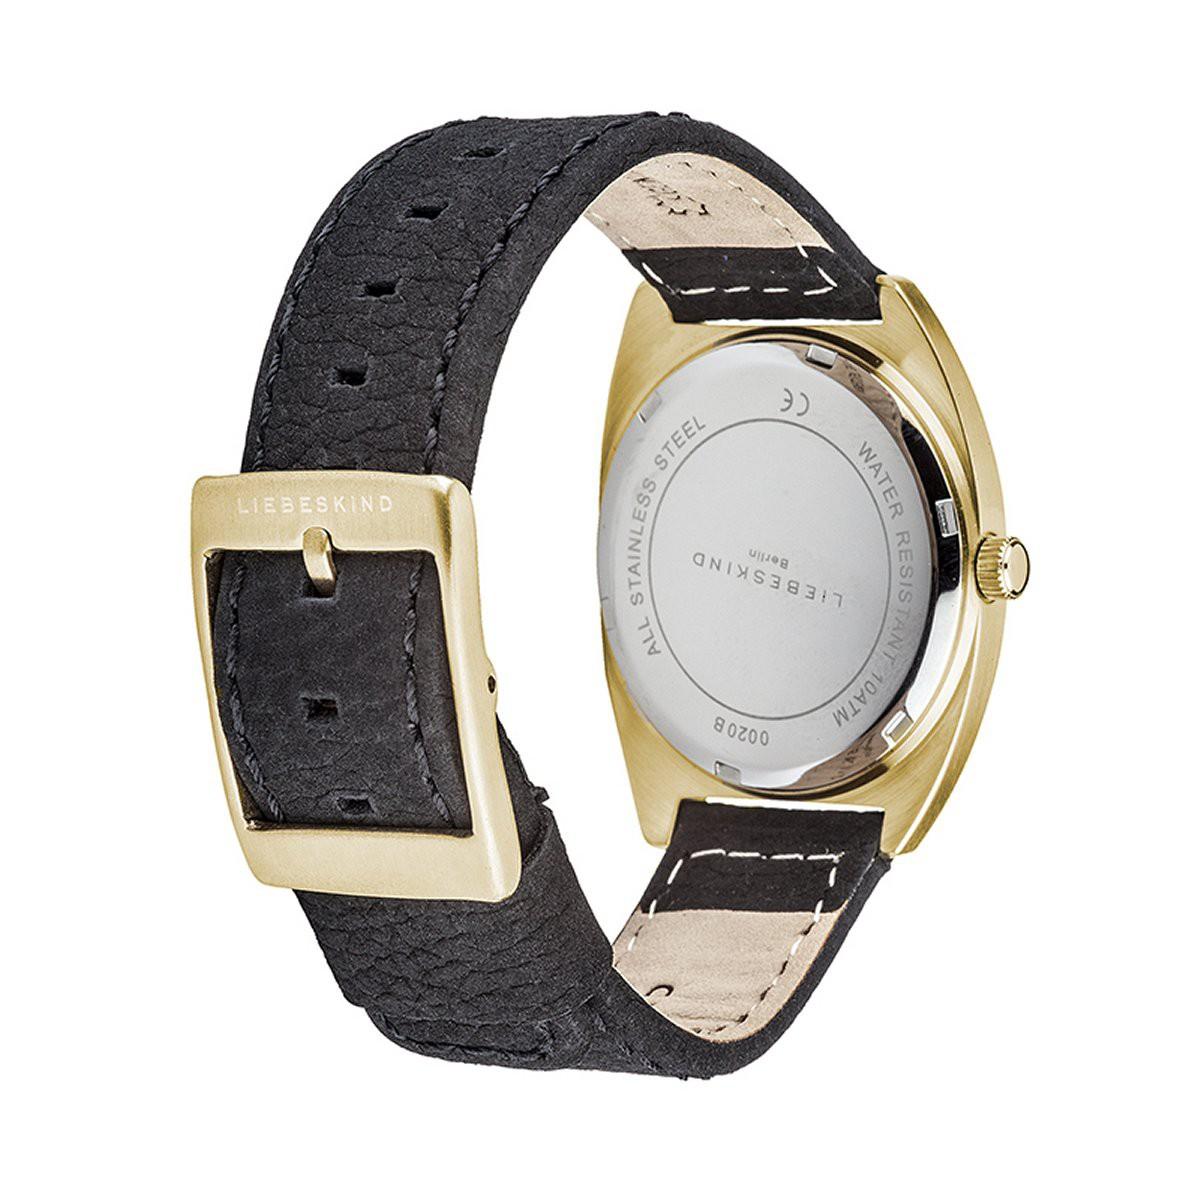 LIEBESKIND BERLIN Damen Uhr Armbanduhr Leder LT-0015-LQ